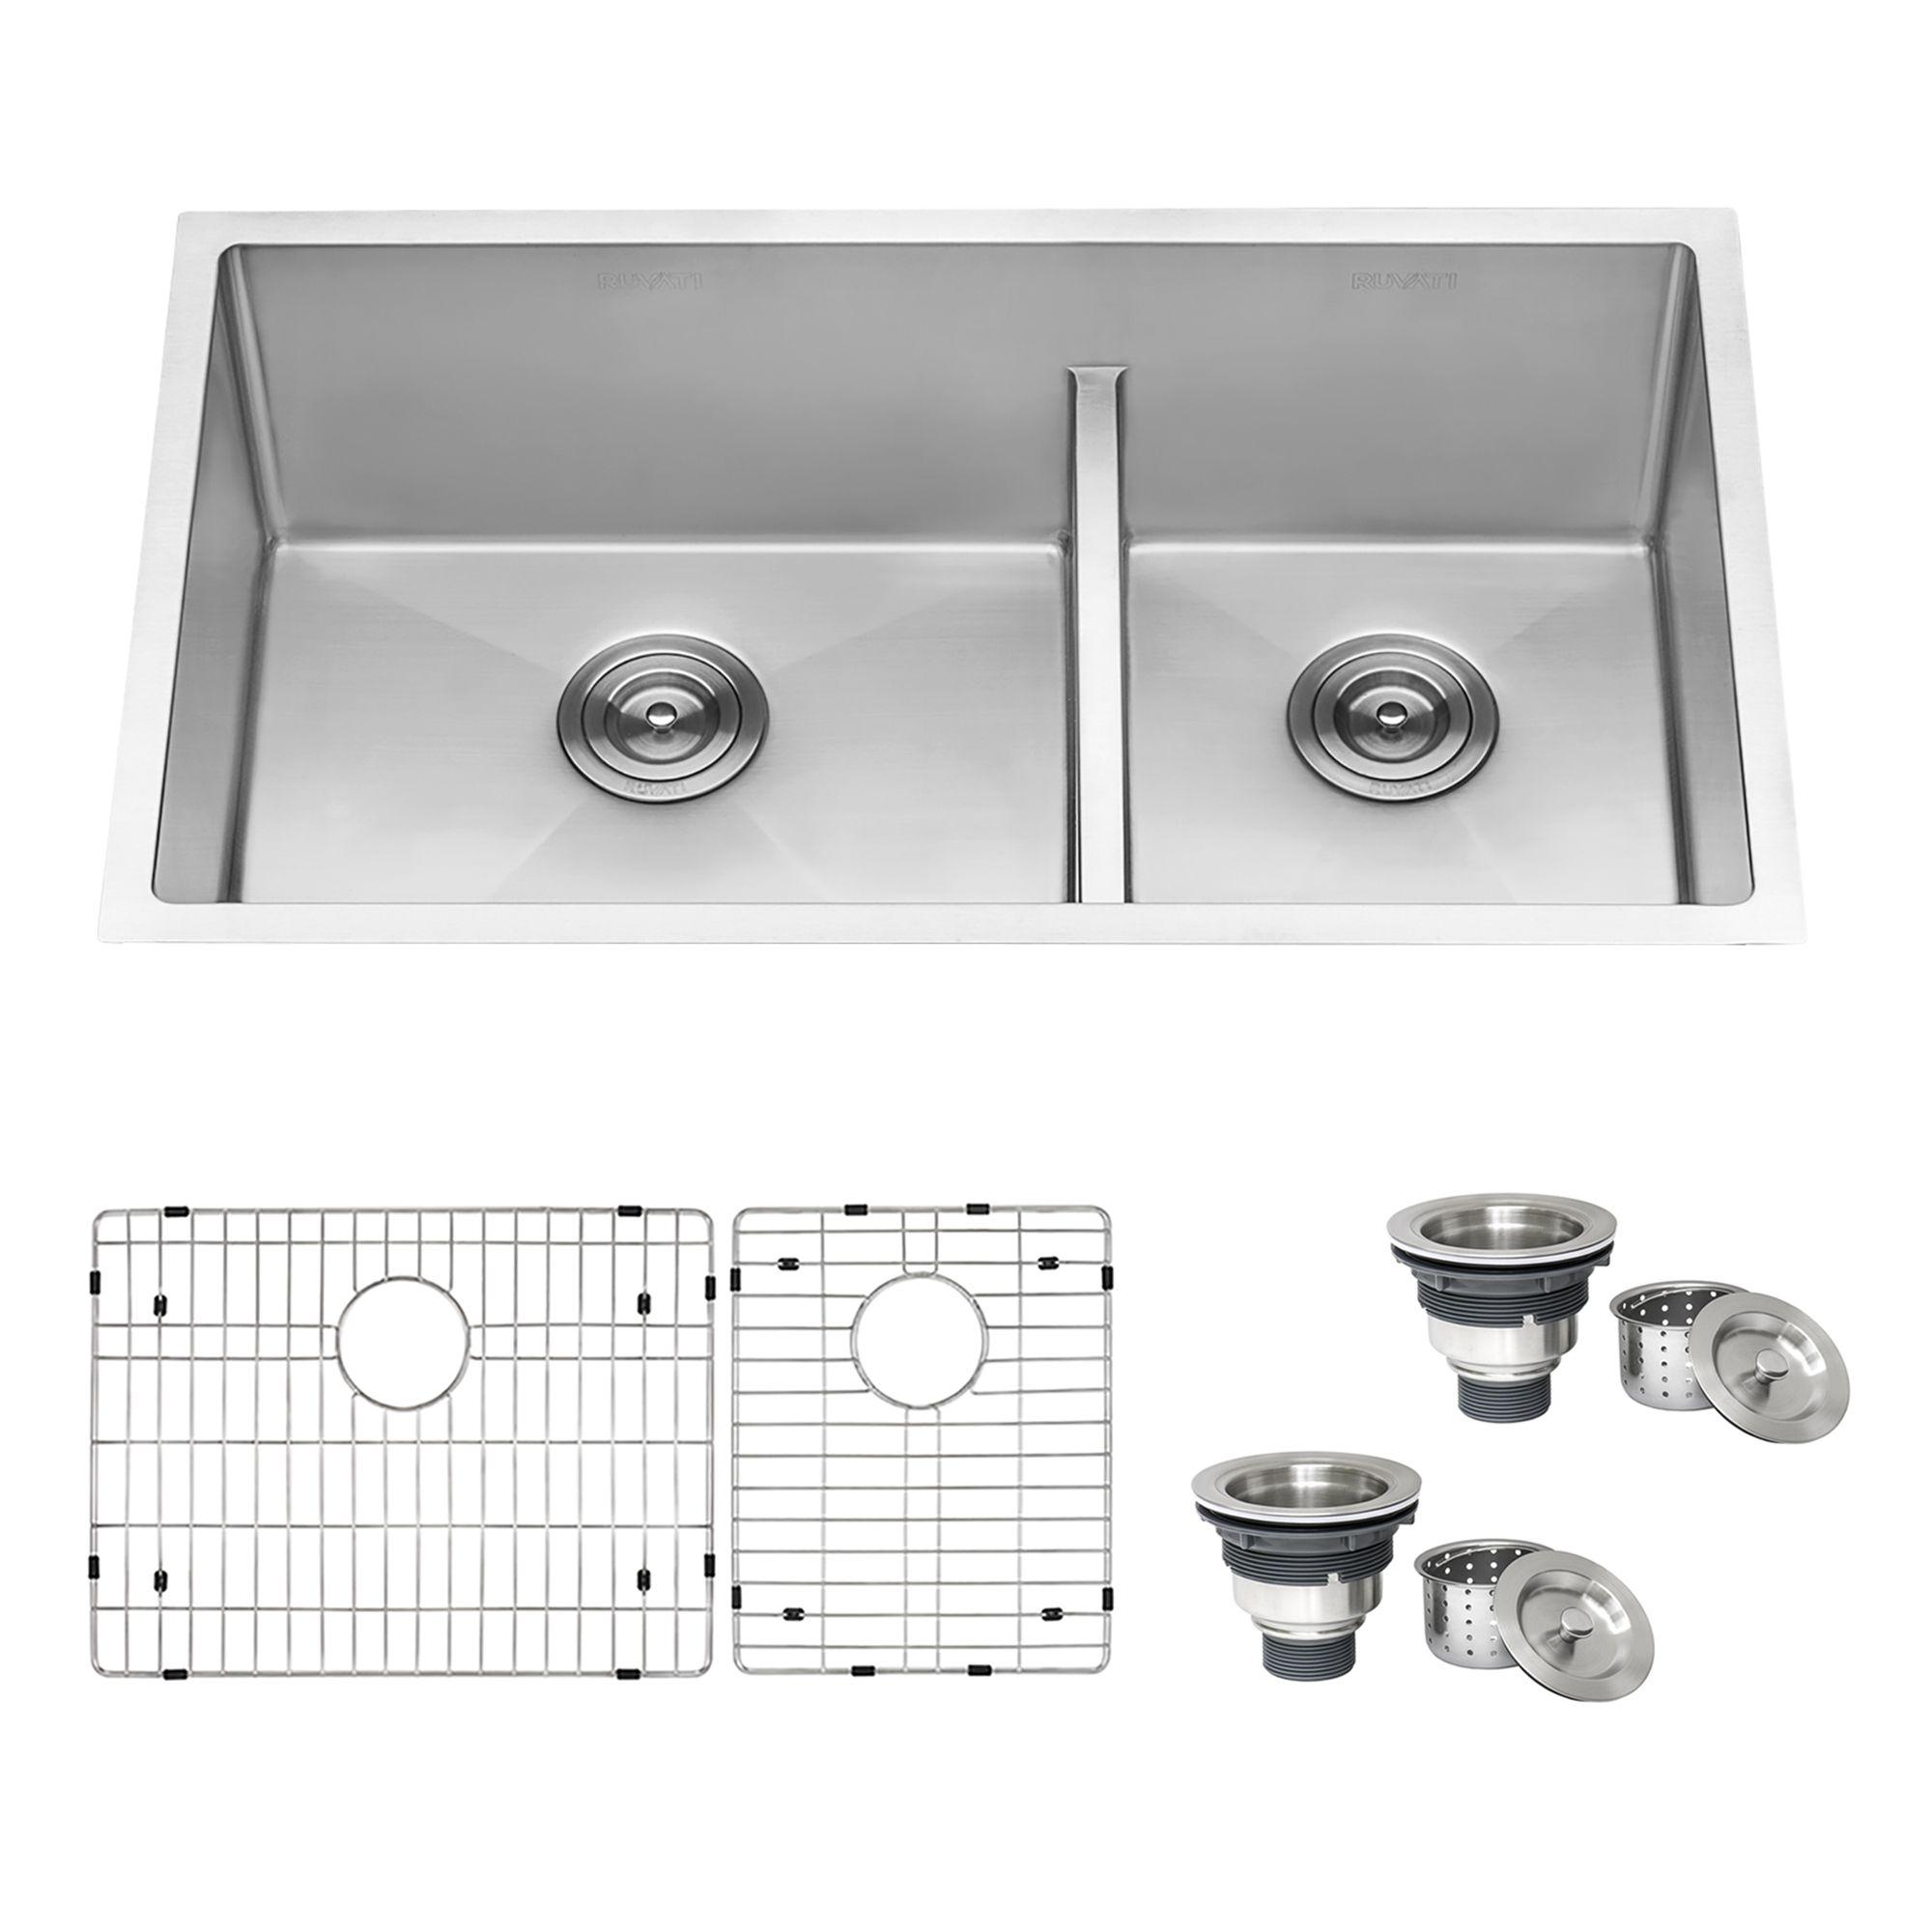 33 Inch Low Divide Undermount Tight Radius 60 40 Double Bowl 16 Gauge Stainless Steel Kitchen Sink Ruvati Usa Stainless Steel Kitchen Sink Double Bowl Sink Sink